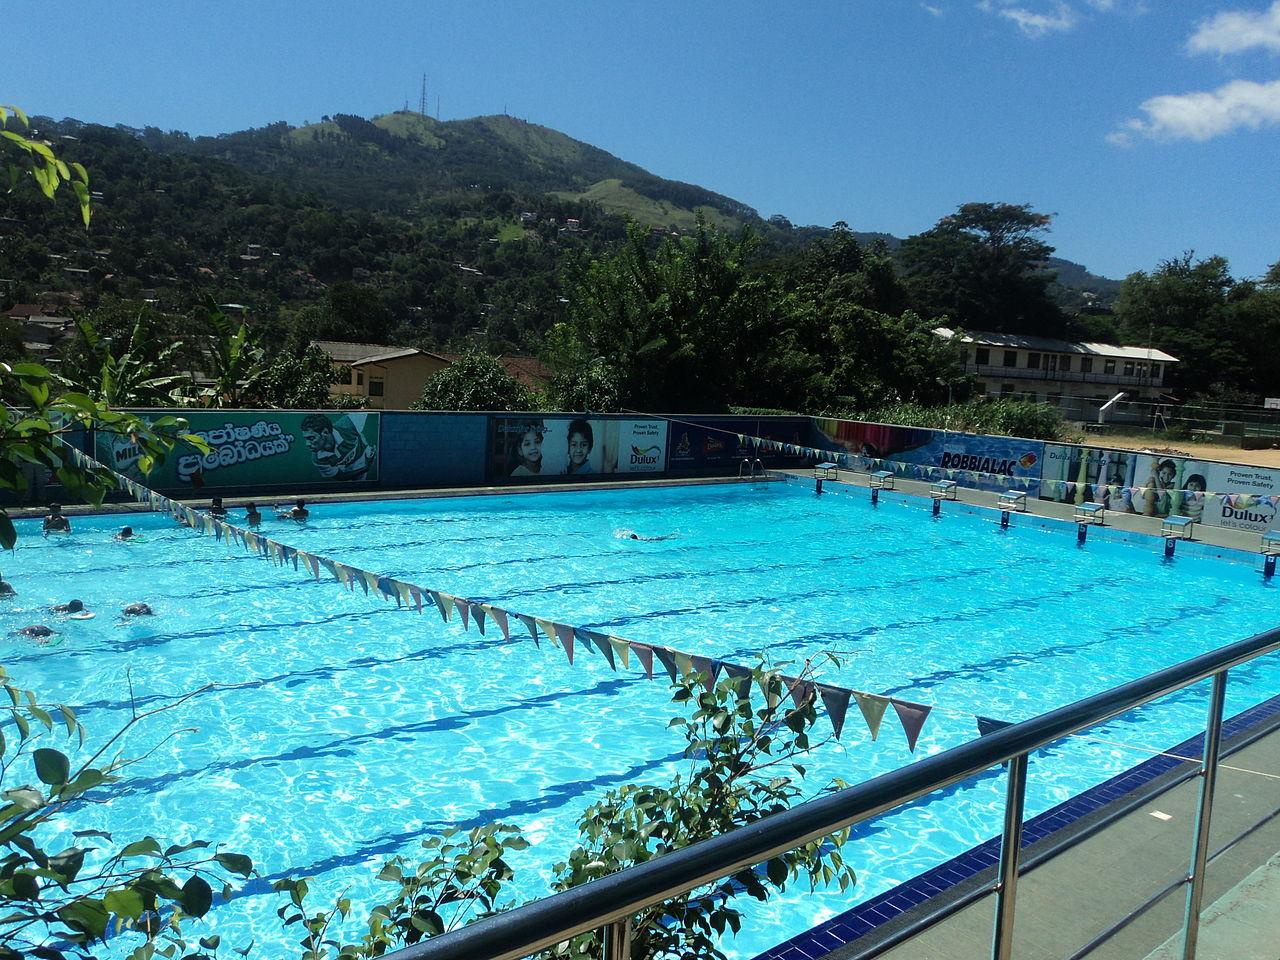 FileKingswood College Kandy Sri Lanka  swimming pool 1